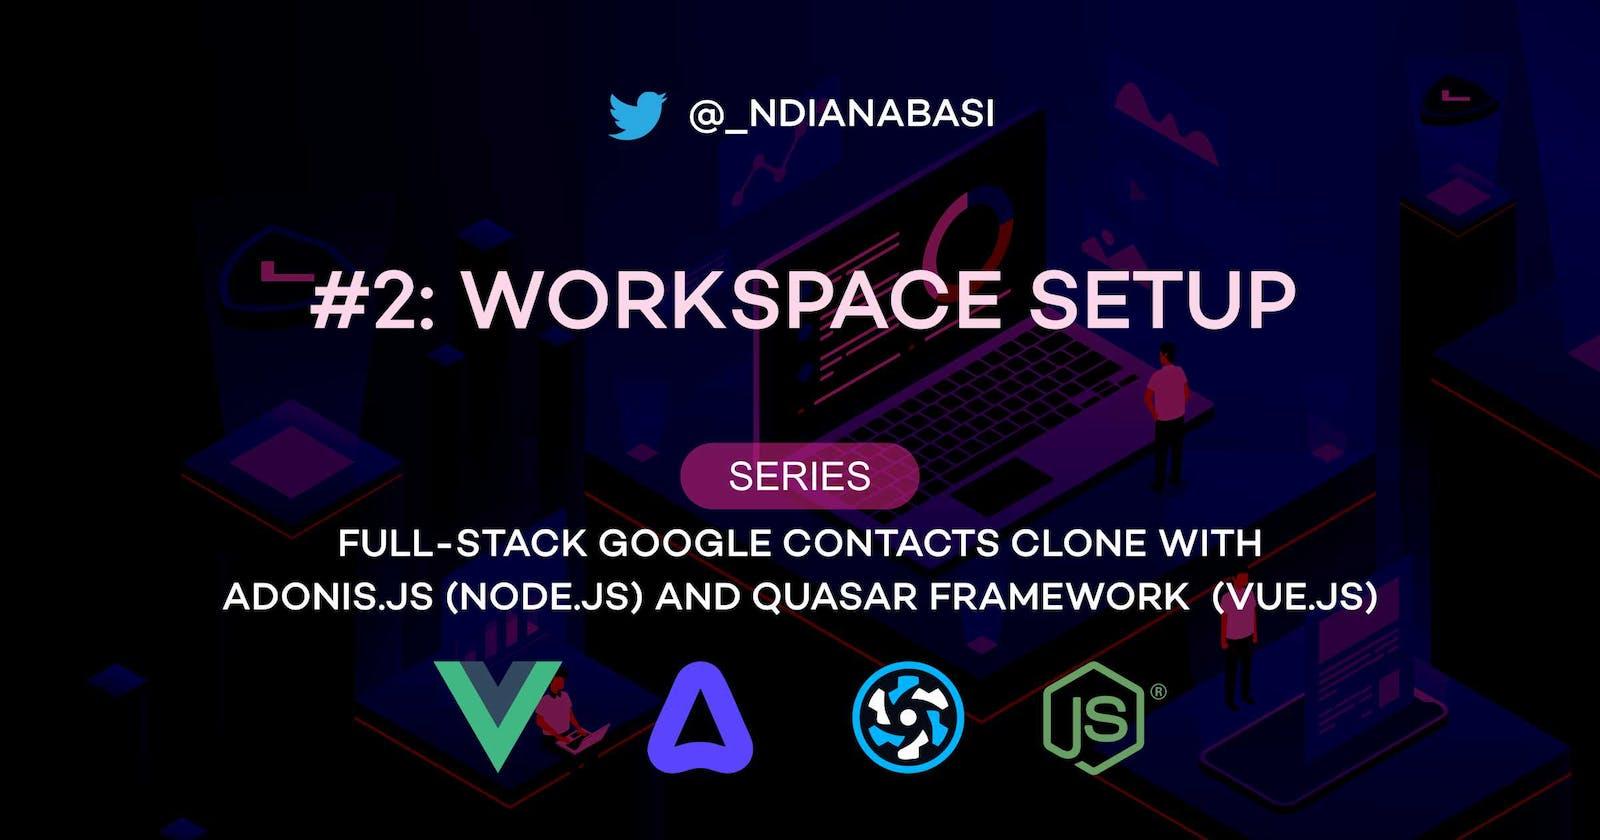 Workspace Setup   Full-Stack Google Contacts Clone with Adonis.js/Node.js and Quasar (Vue.js)